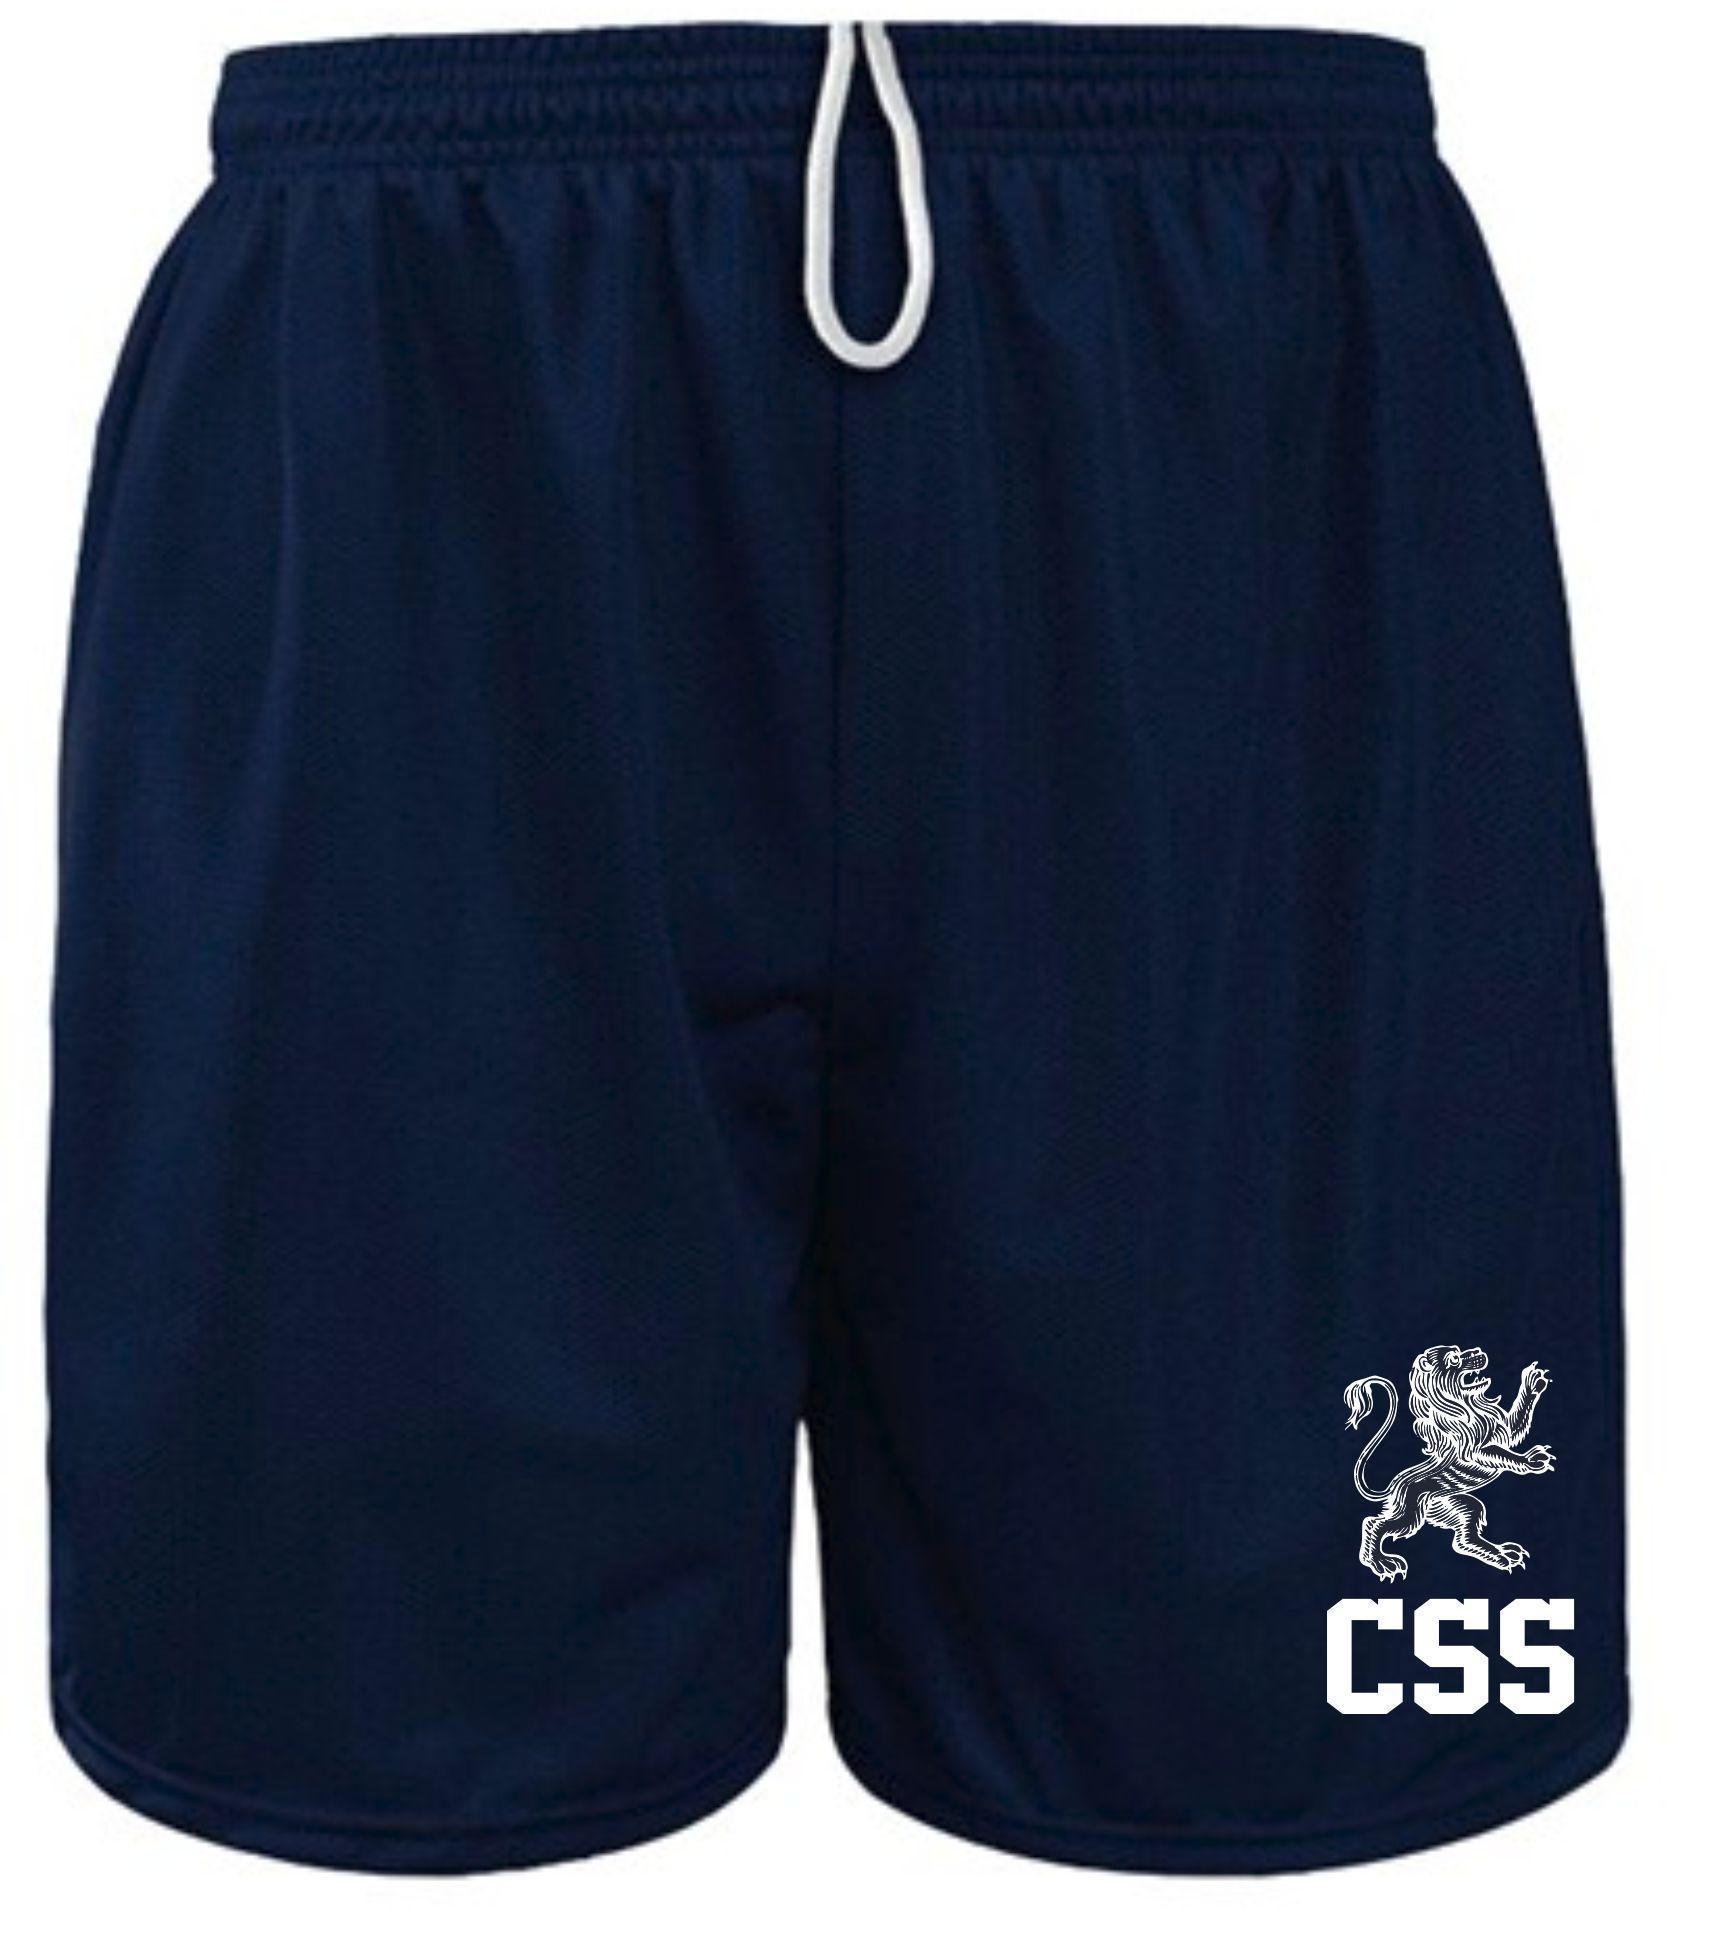 CSS Spirit shorts